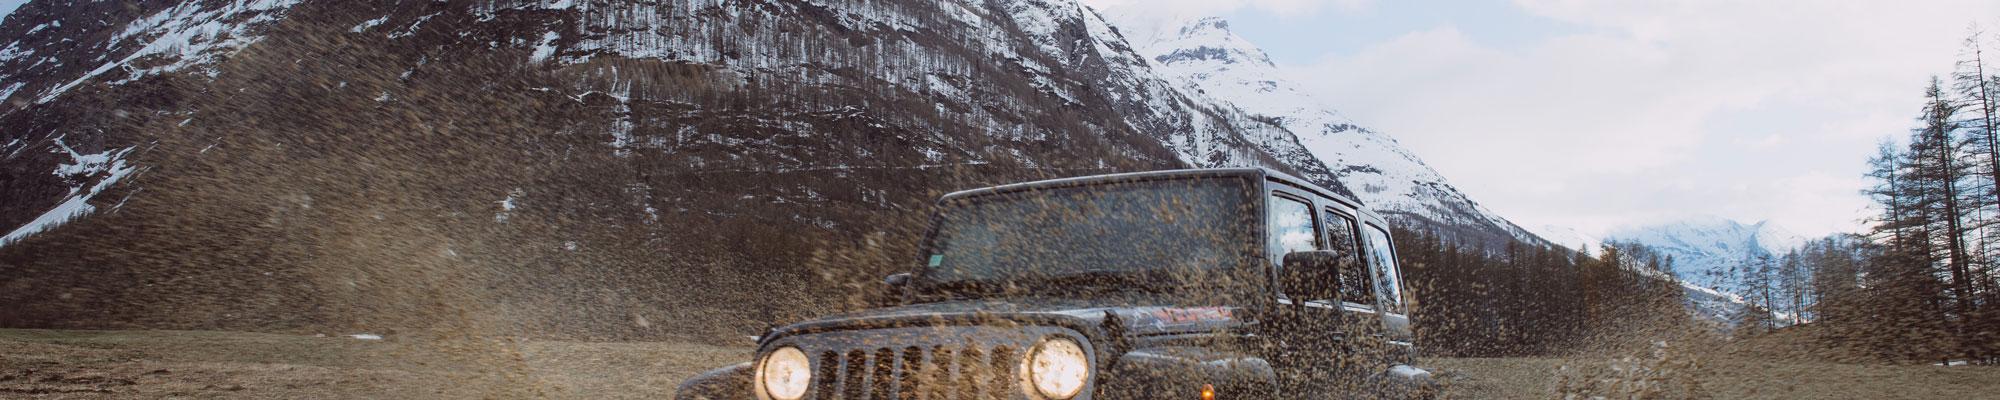 Photograph of car driving through mountains